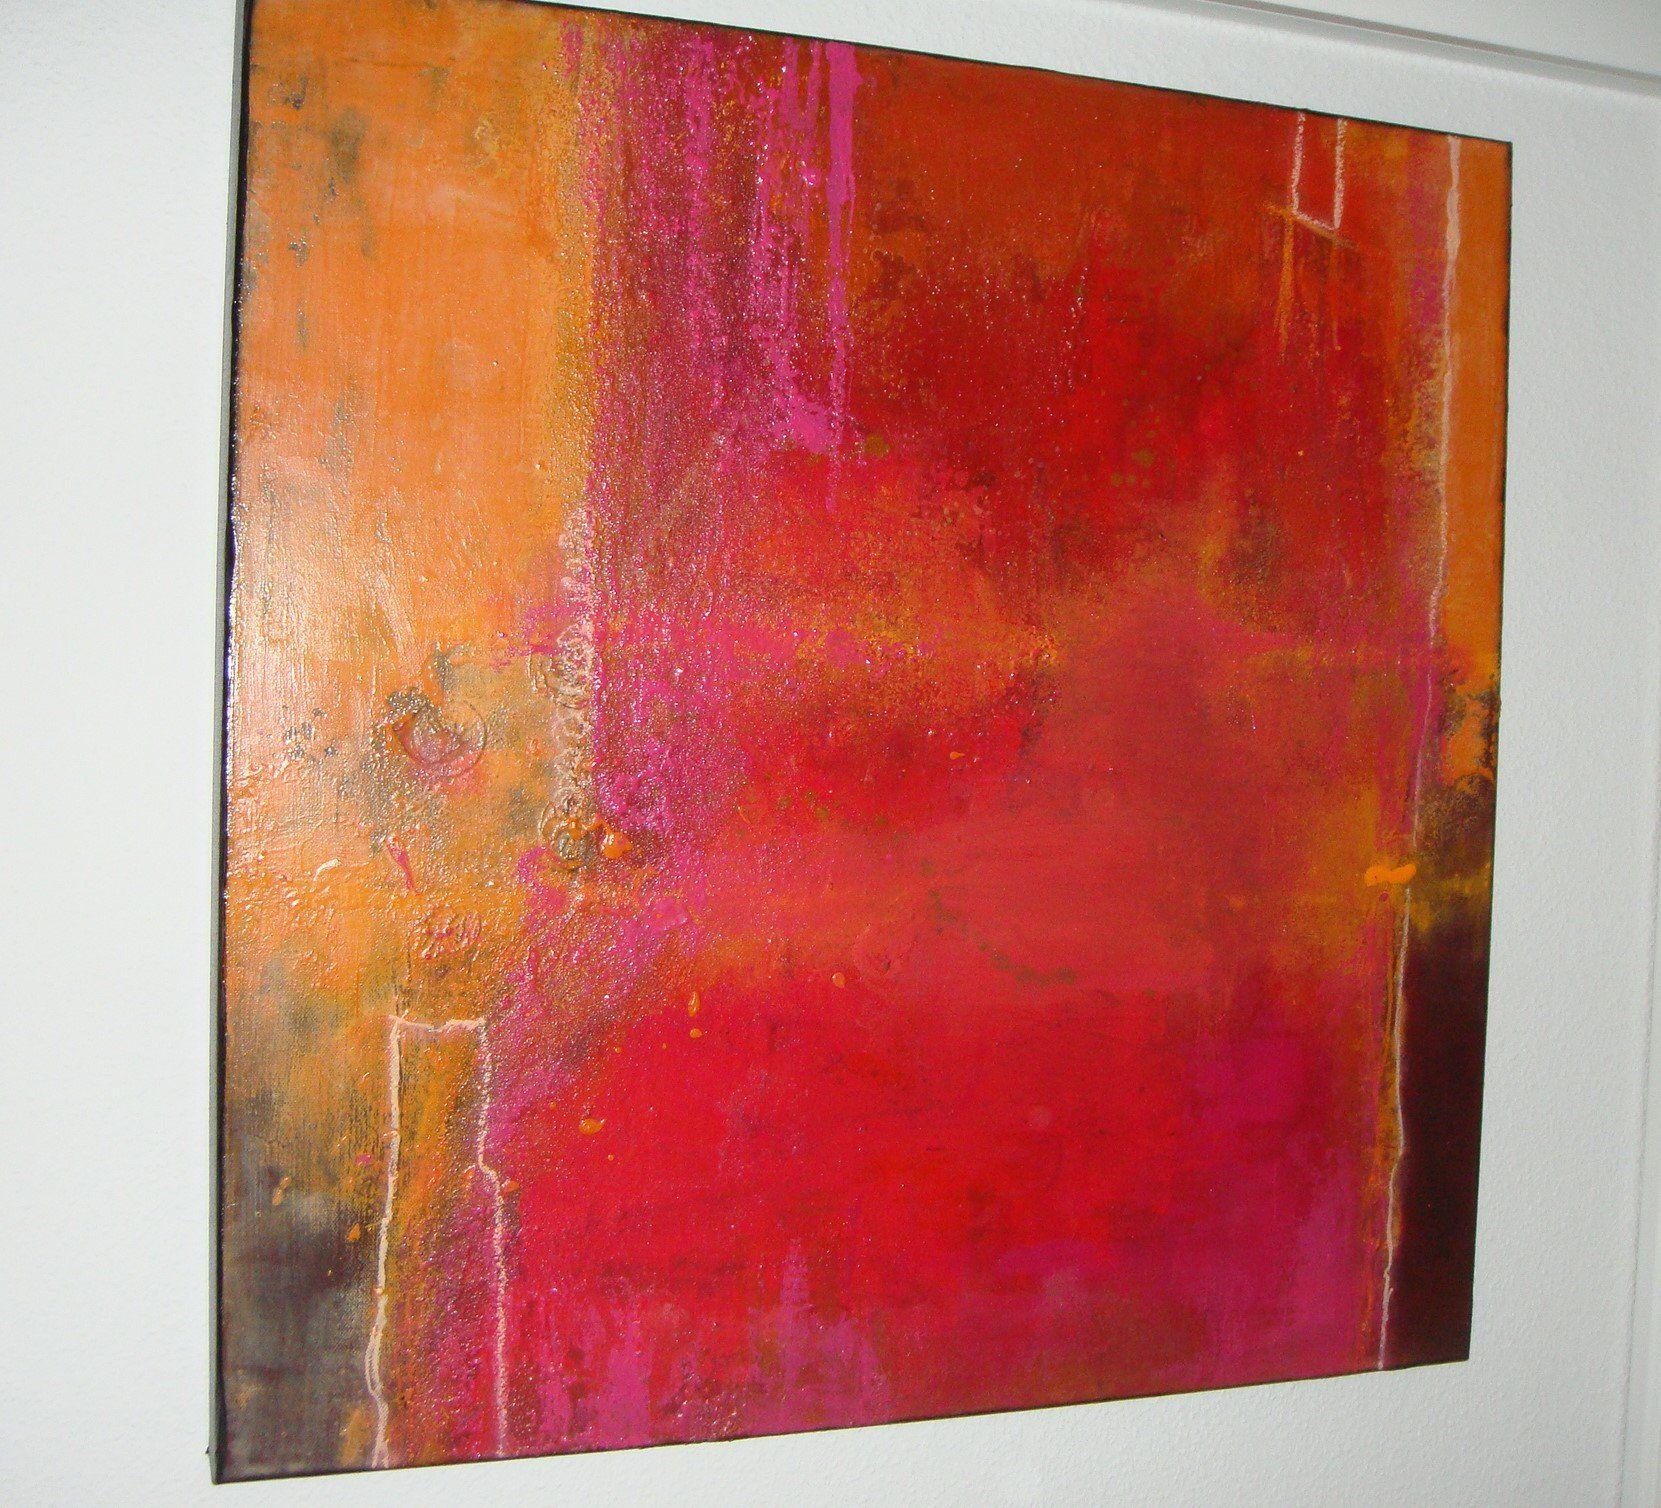 acrylbild liebe 70x70cm bild in etsy art abstract wall wandbilder abstrakte kunst formen